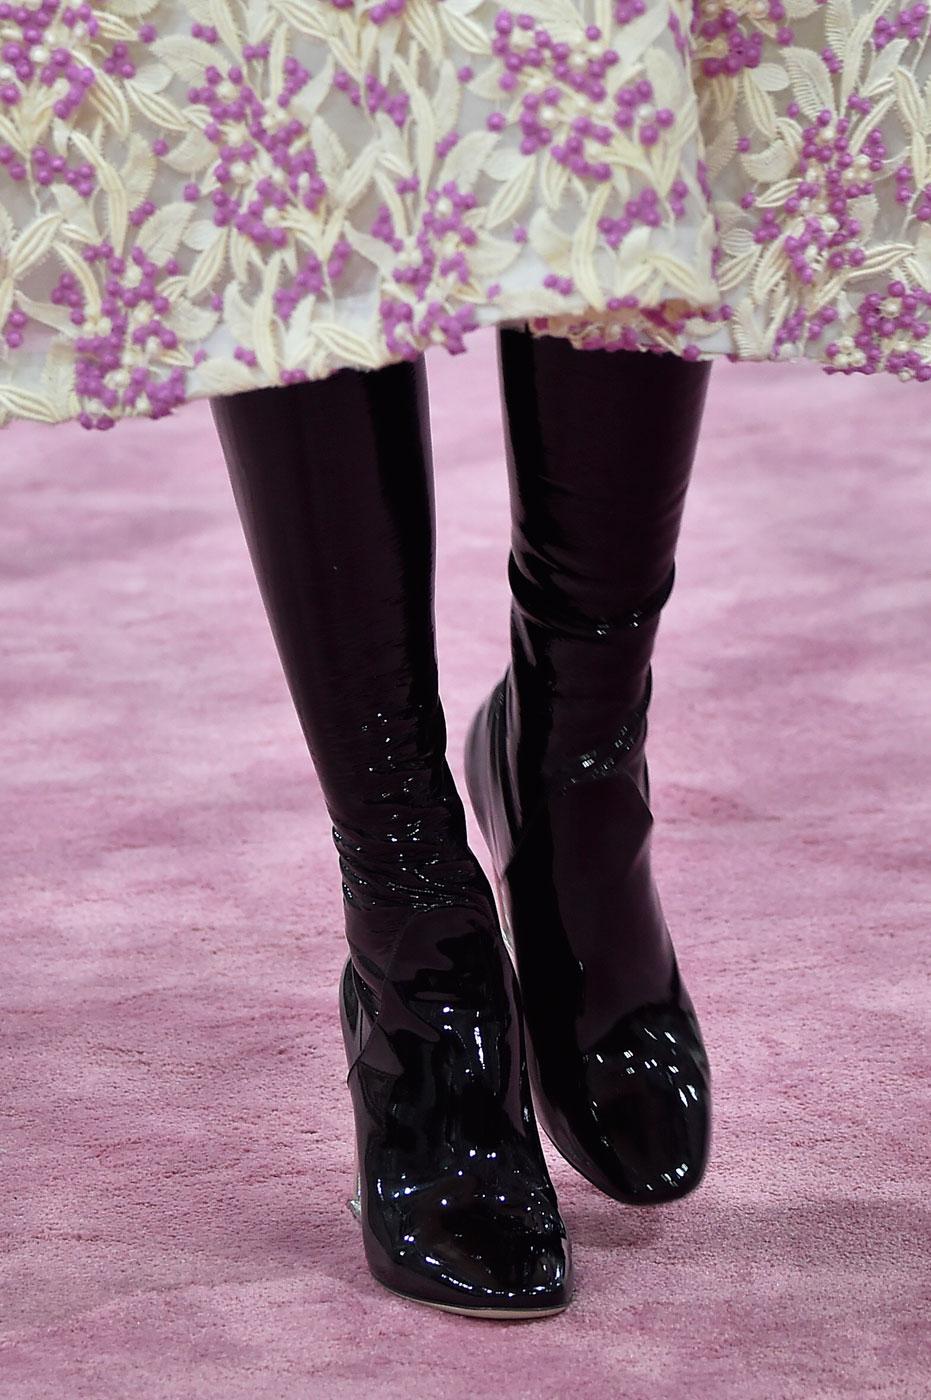 Christian-Dior-fashion-runway-show-close-ups-haute-couture-paris-spring-summer-2015-the-impression-058